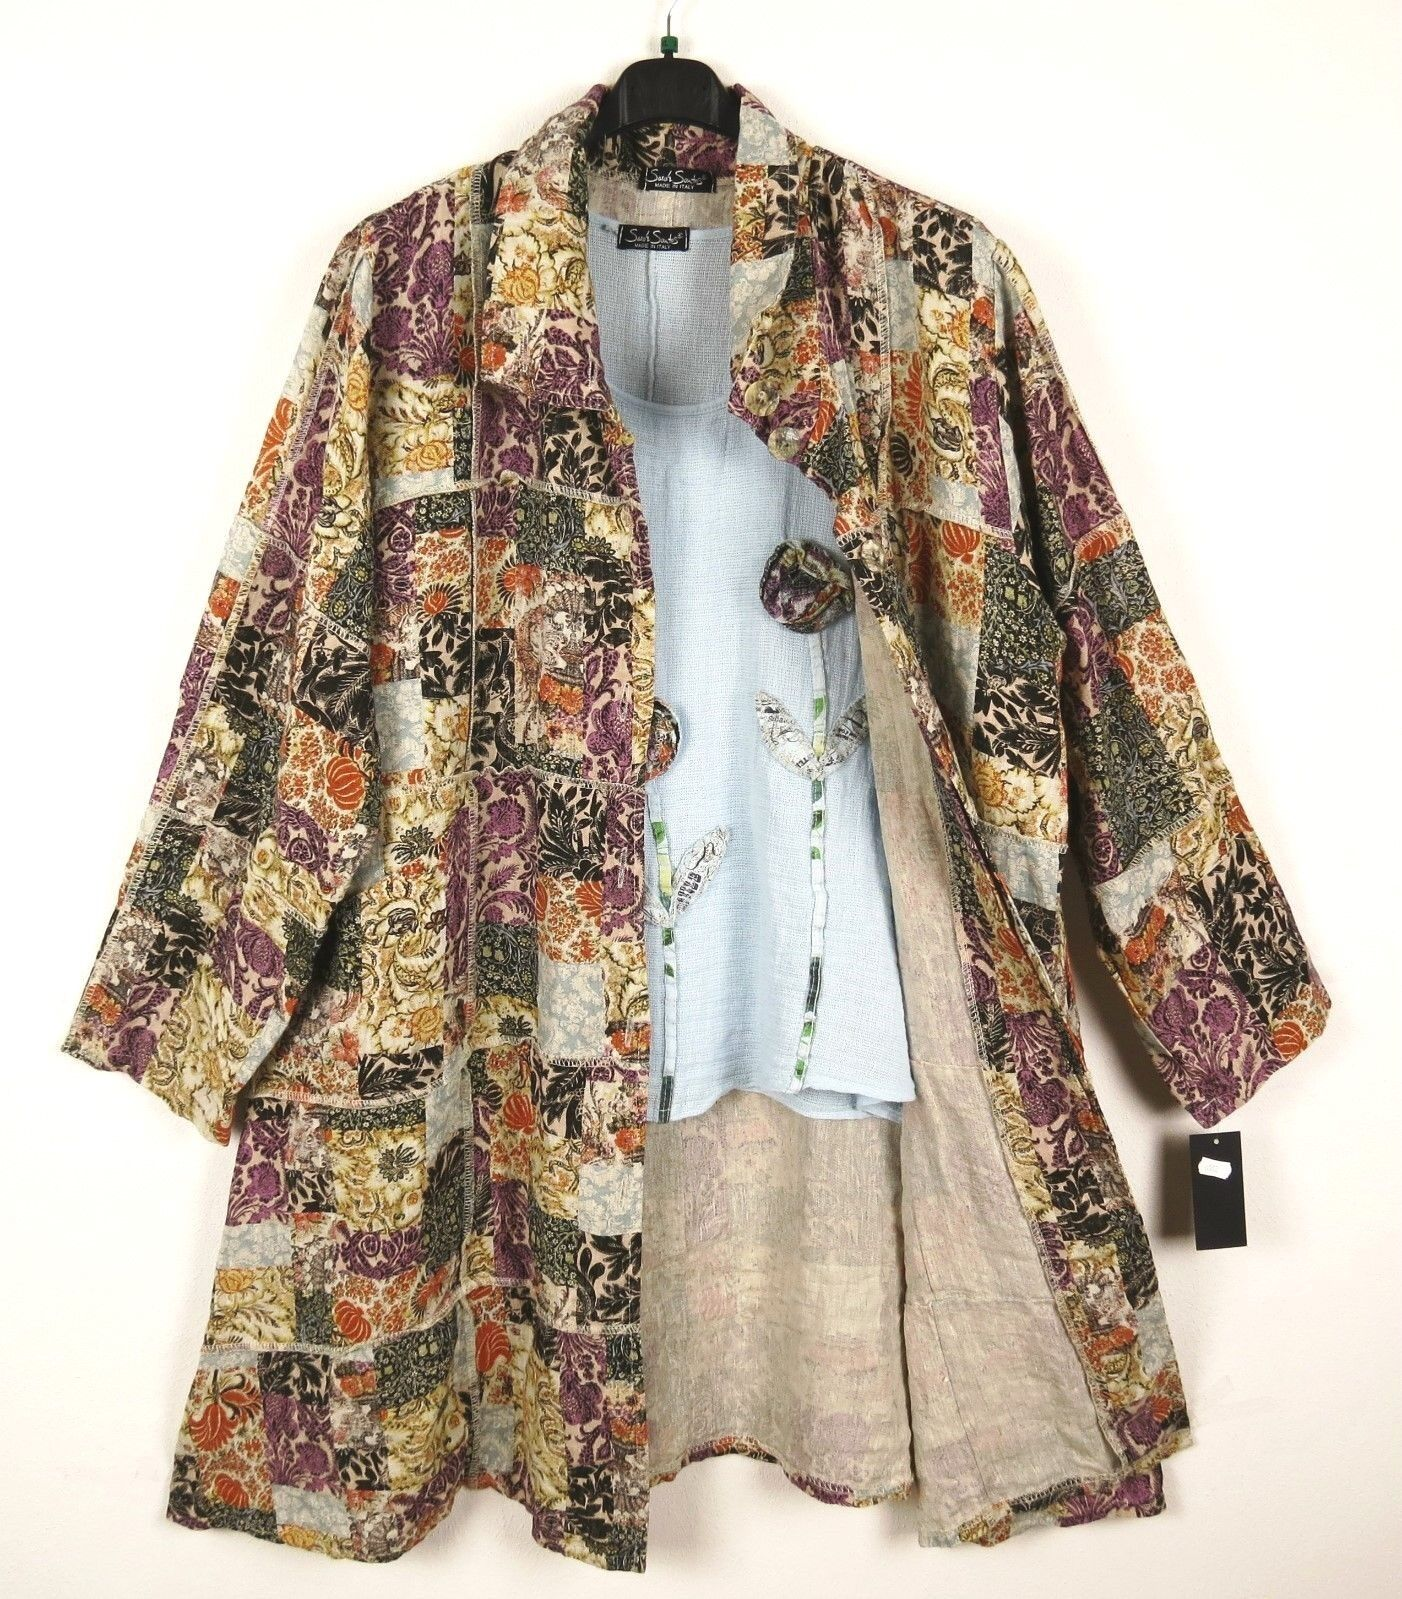 NEU SARAH SANTOS Leinen Mantel Linen Coat Manteau XXL 52 54 Lagenlook